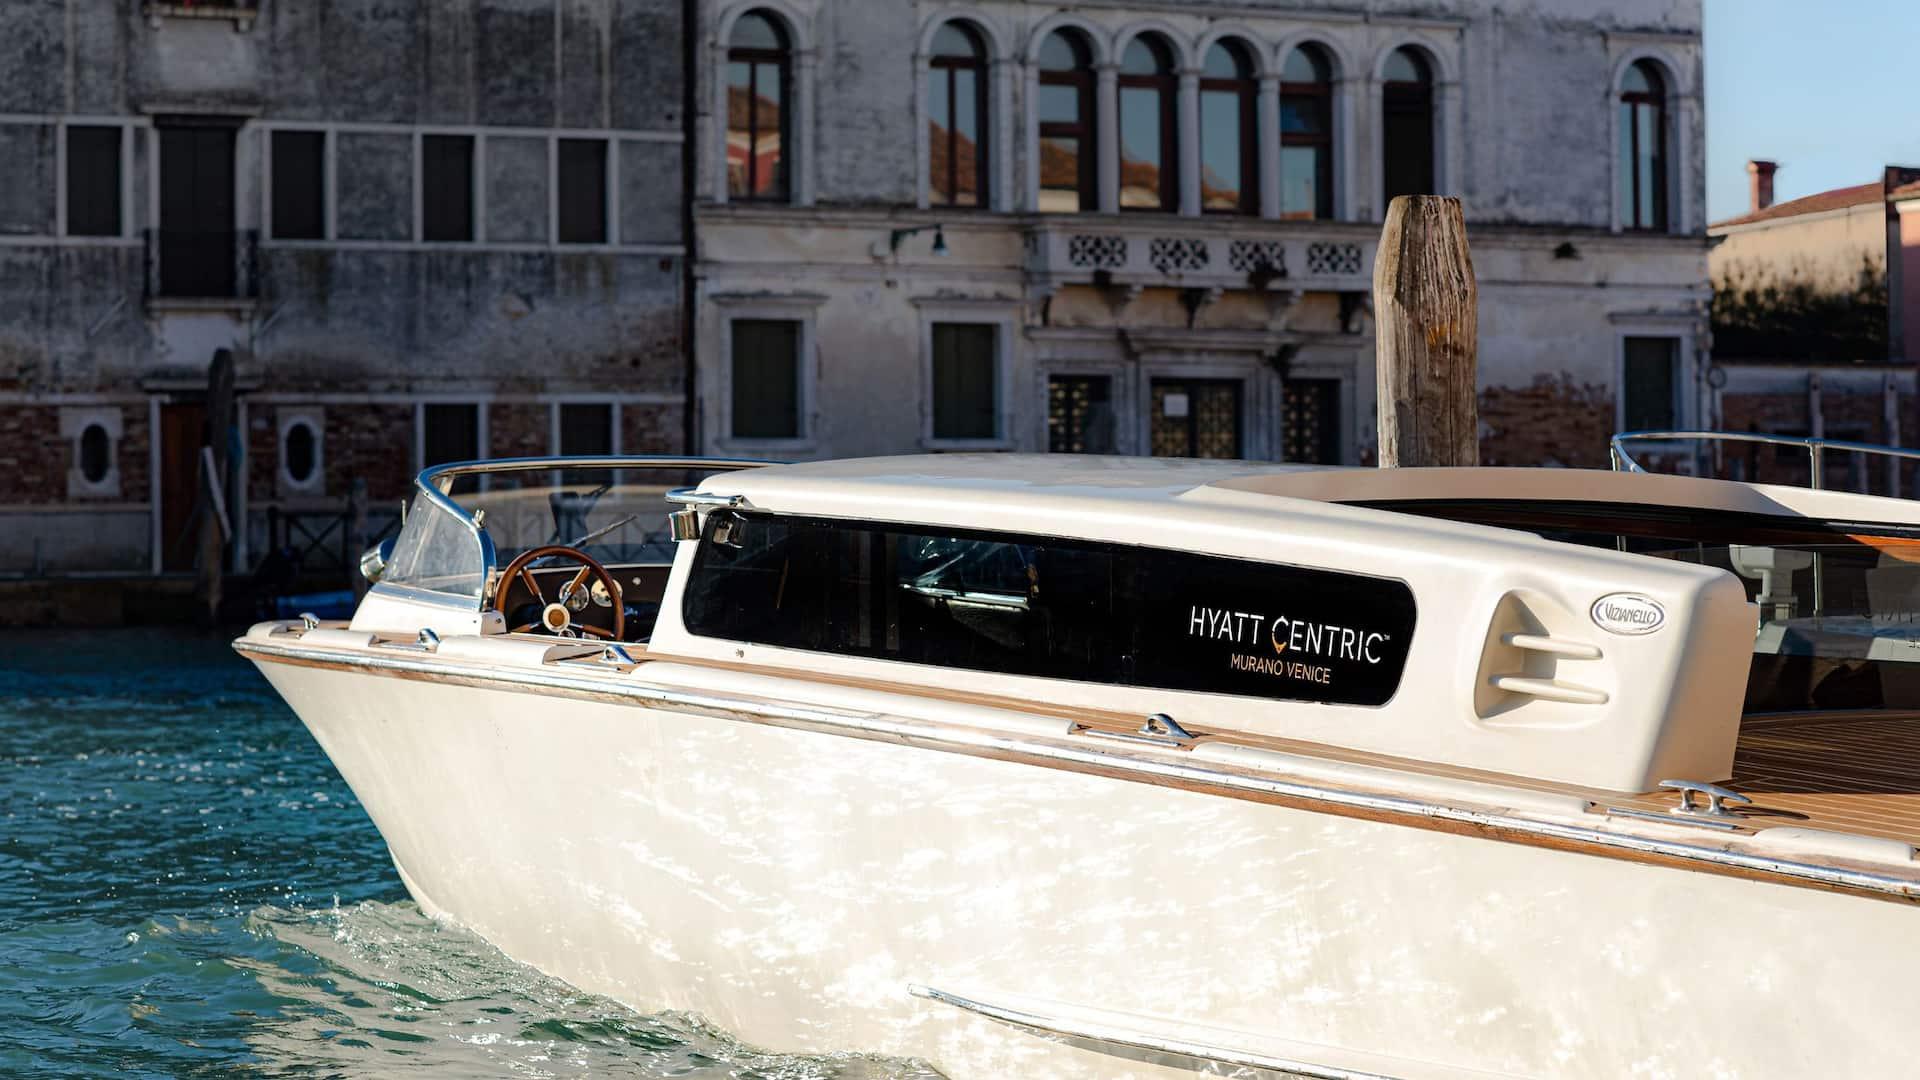 Hyatt Centric Murano Venice entrance